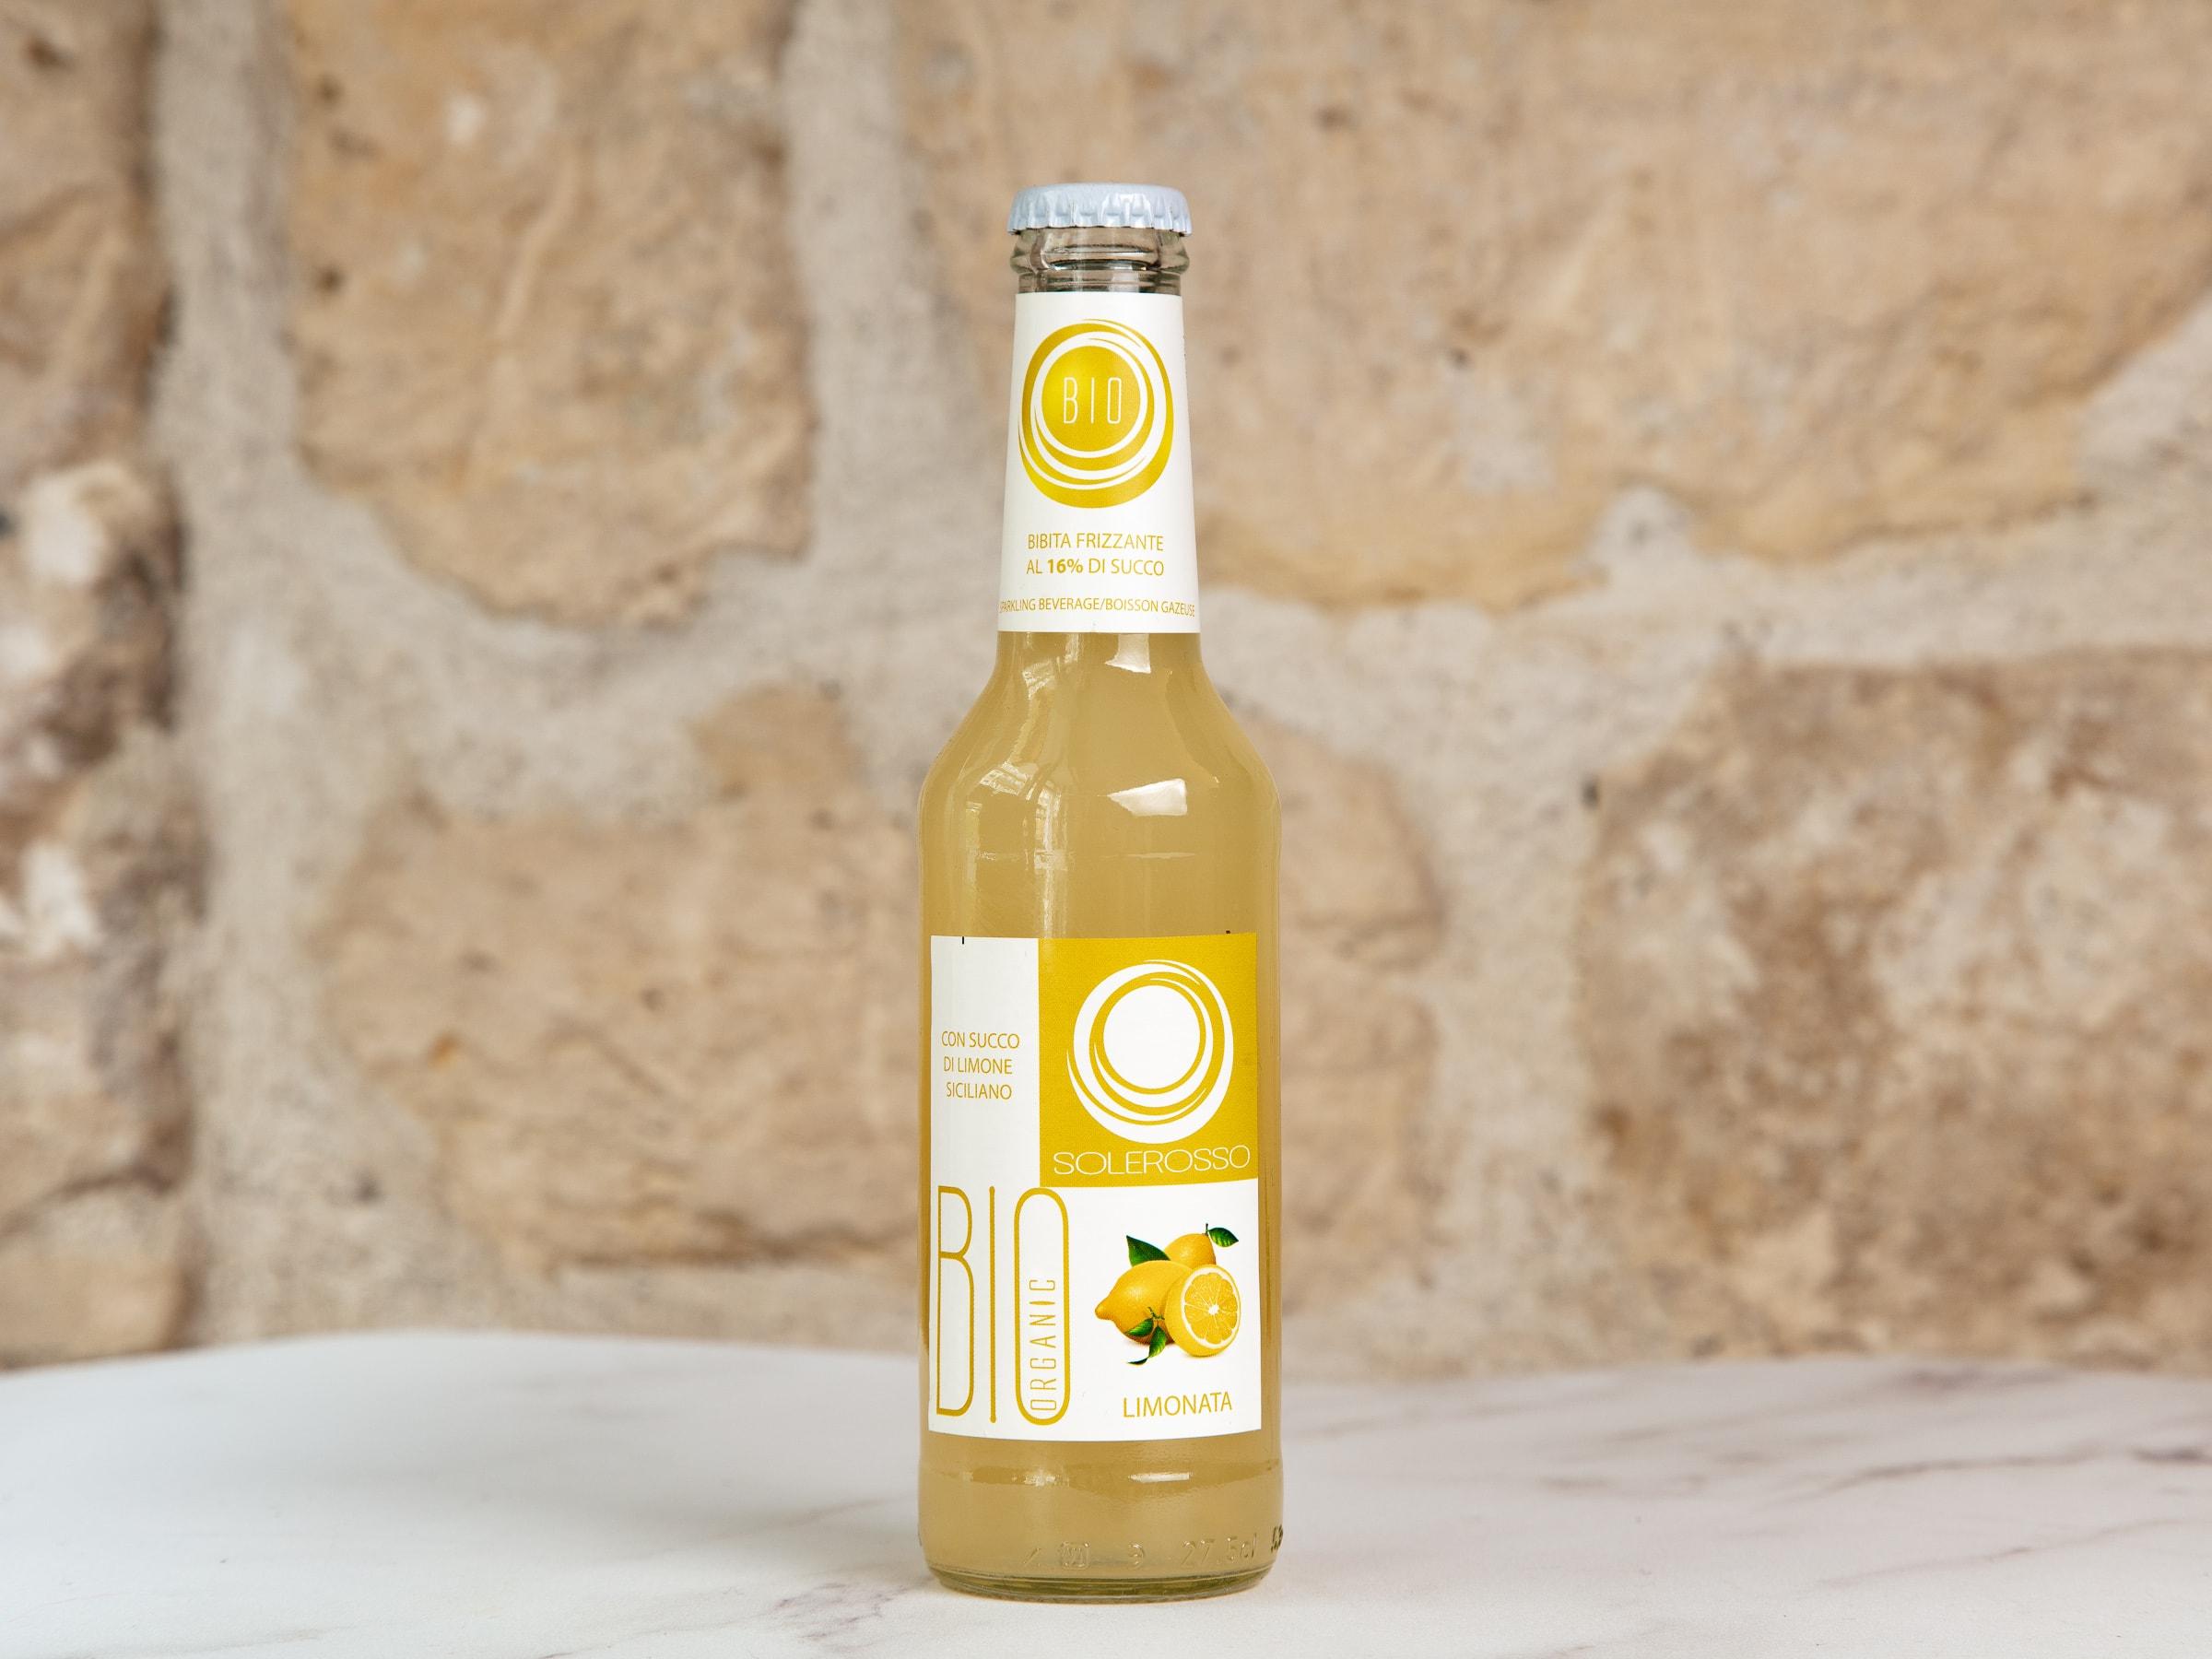 limonade artisanale sicilienne